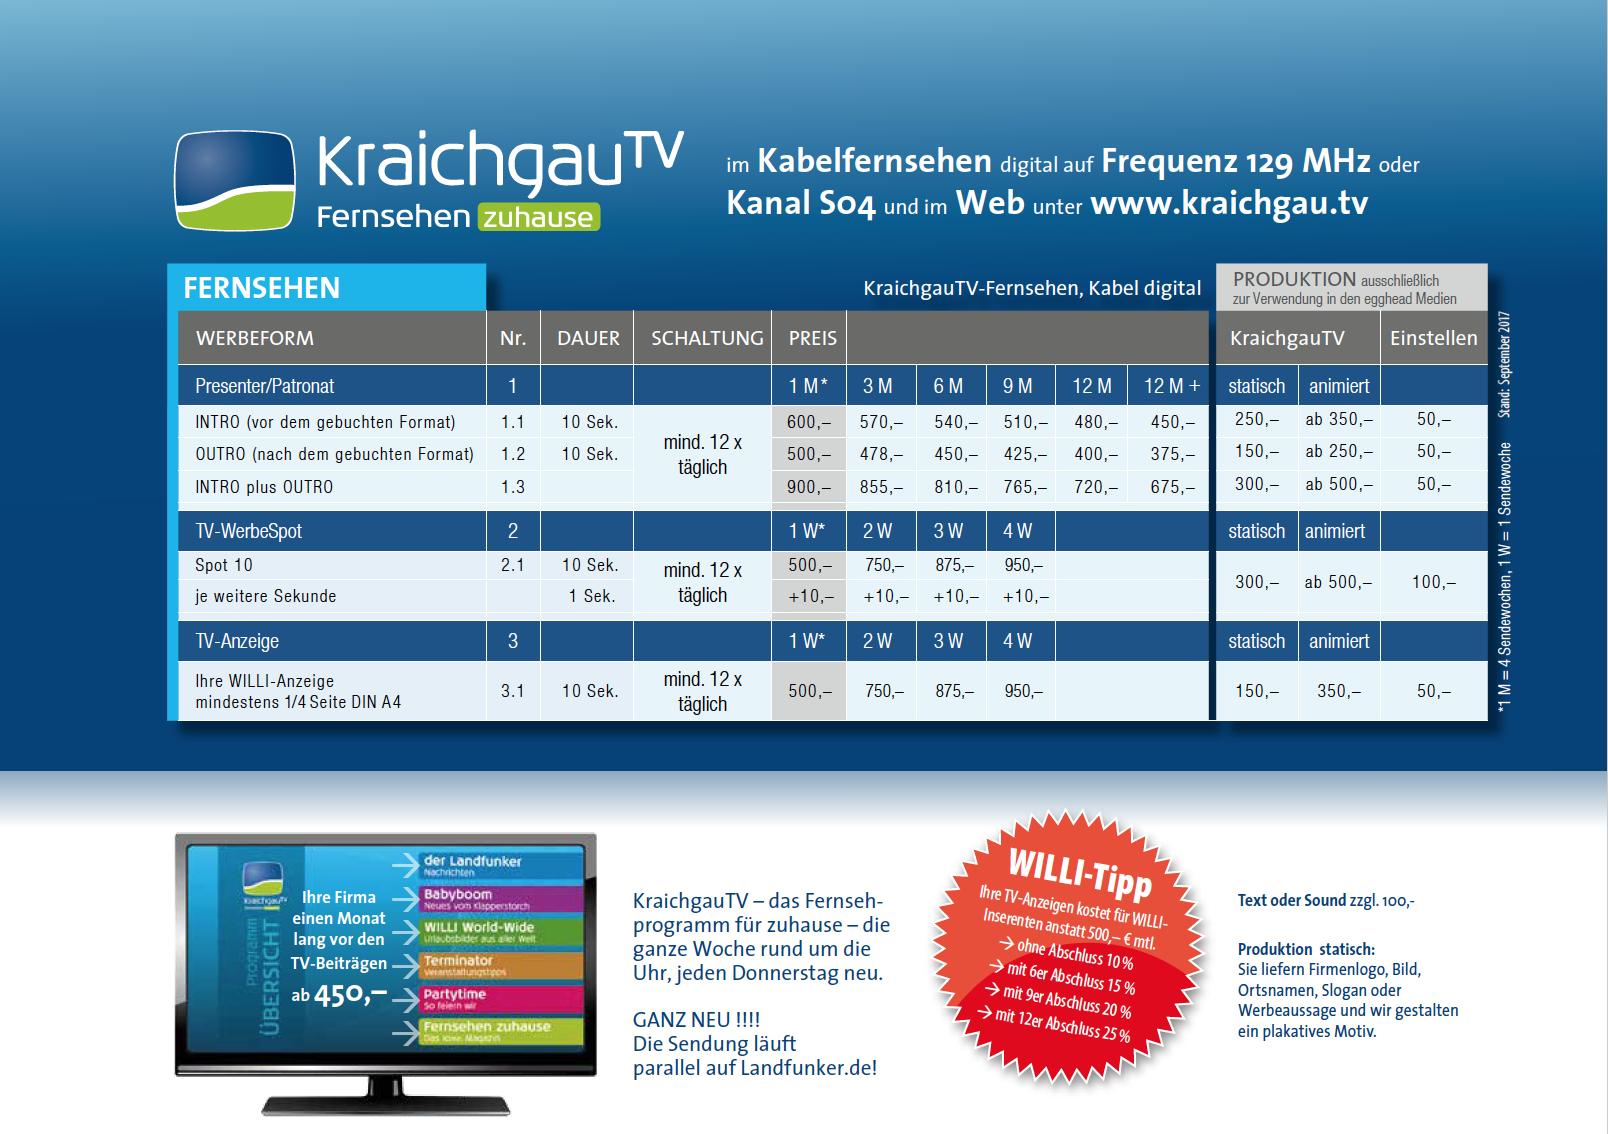 Preistabelle KraichgauTV